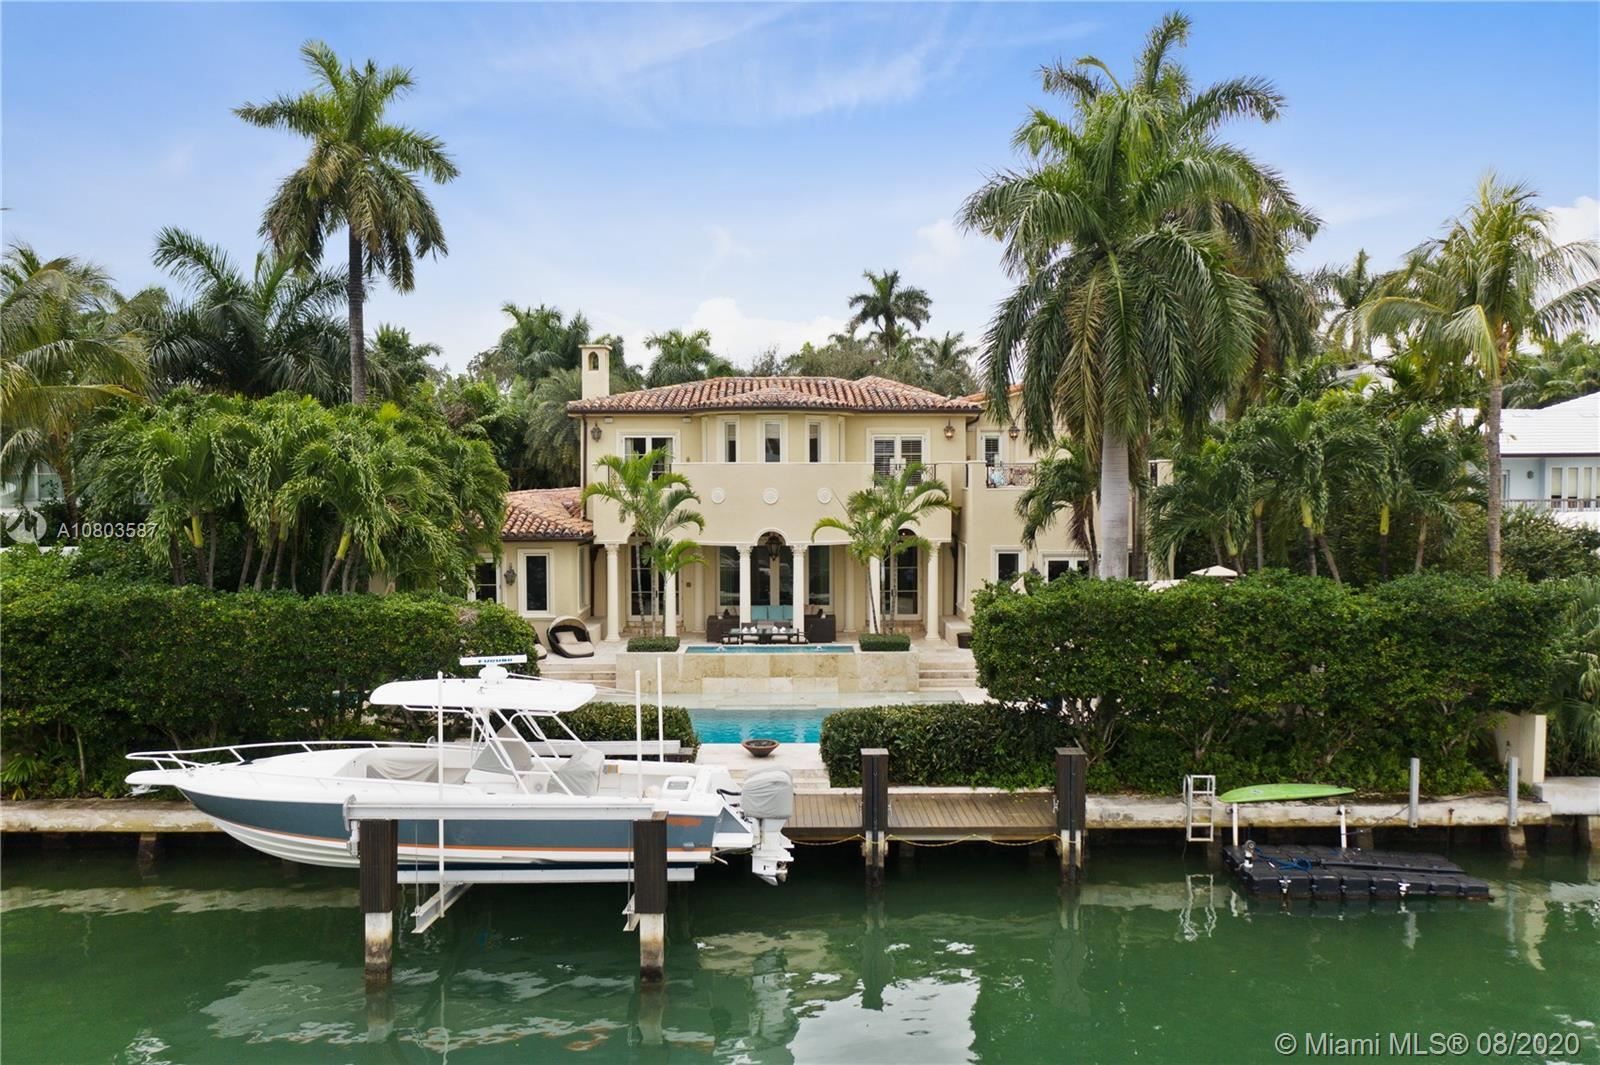 Photo 1 of Listing MLS a10803587 in 1511 W 27th St Miami Beach FL 33140